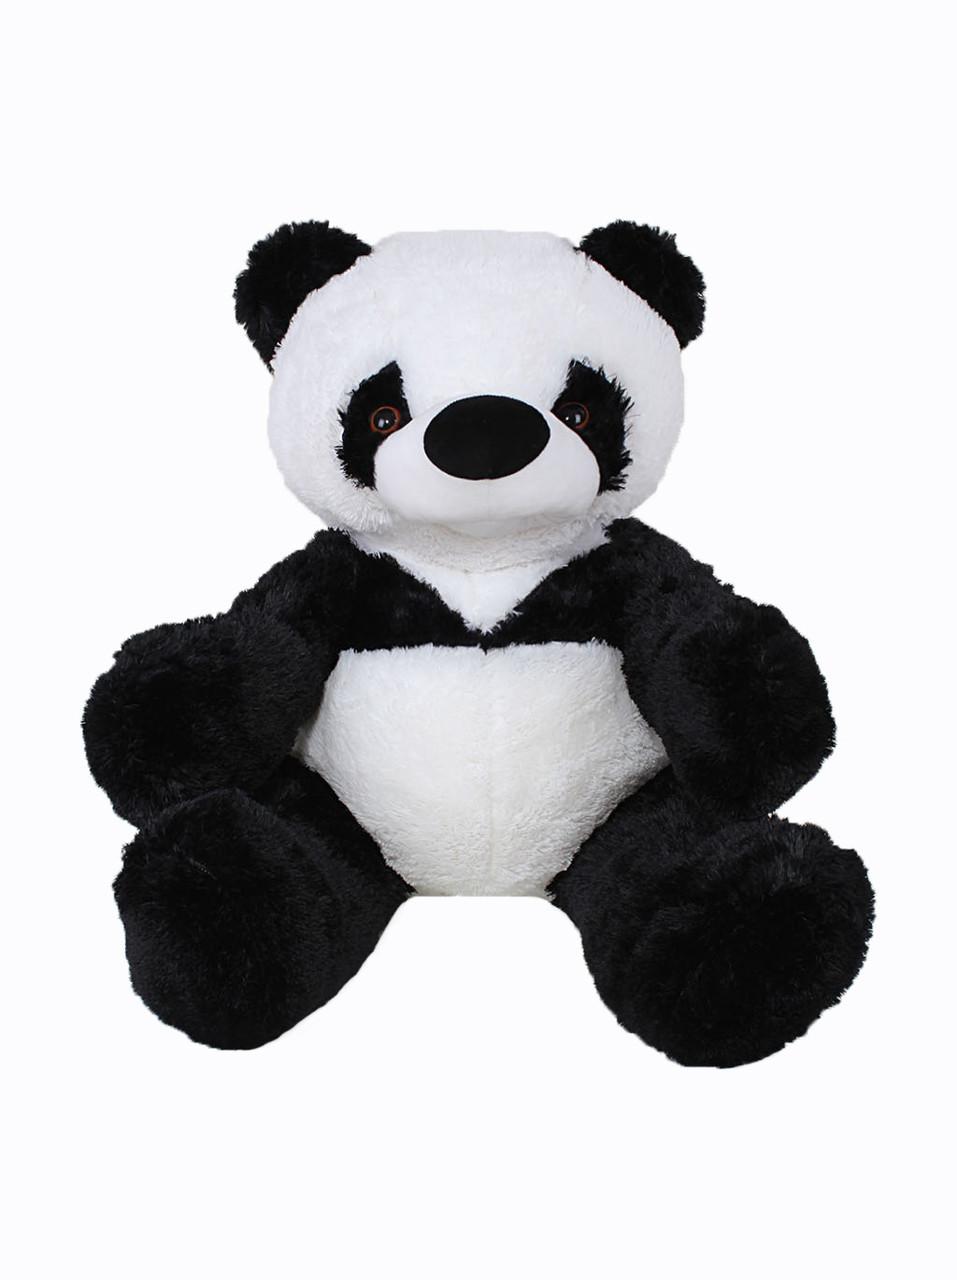 Плюшевая панда(мягкая игрушка)  170 см Алина